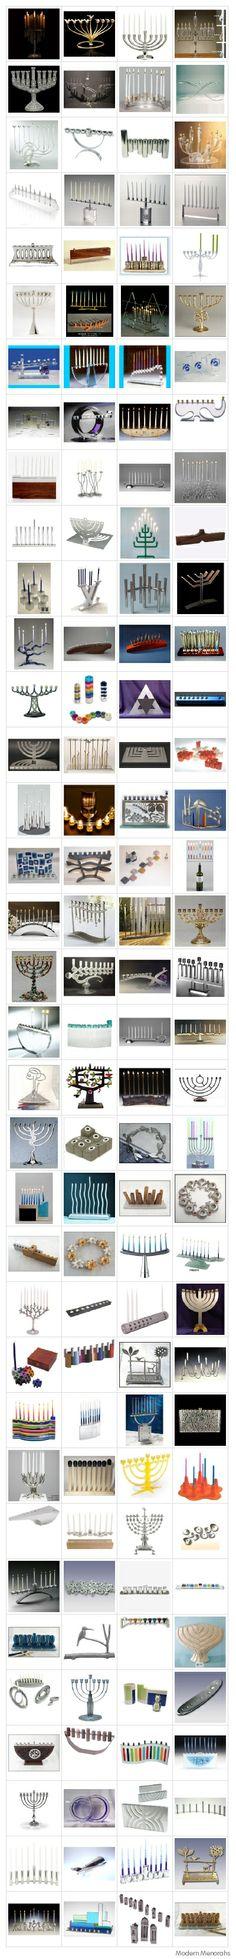 The Mongo Modern Menorah List: Over 140 Hip Chanukah Candelabras #menorah #modernmenorah #chanukah #hannuka